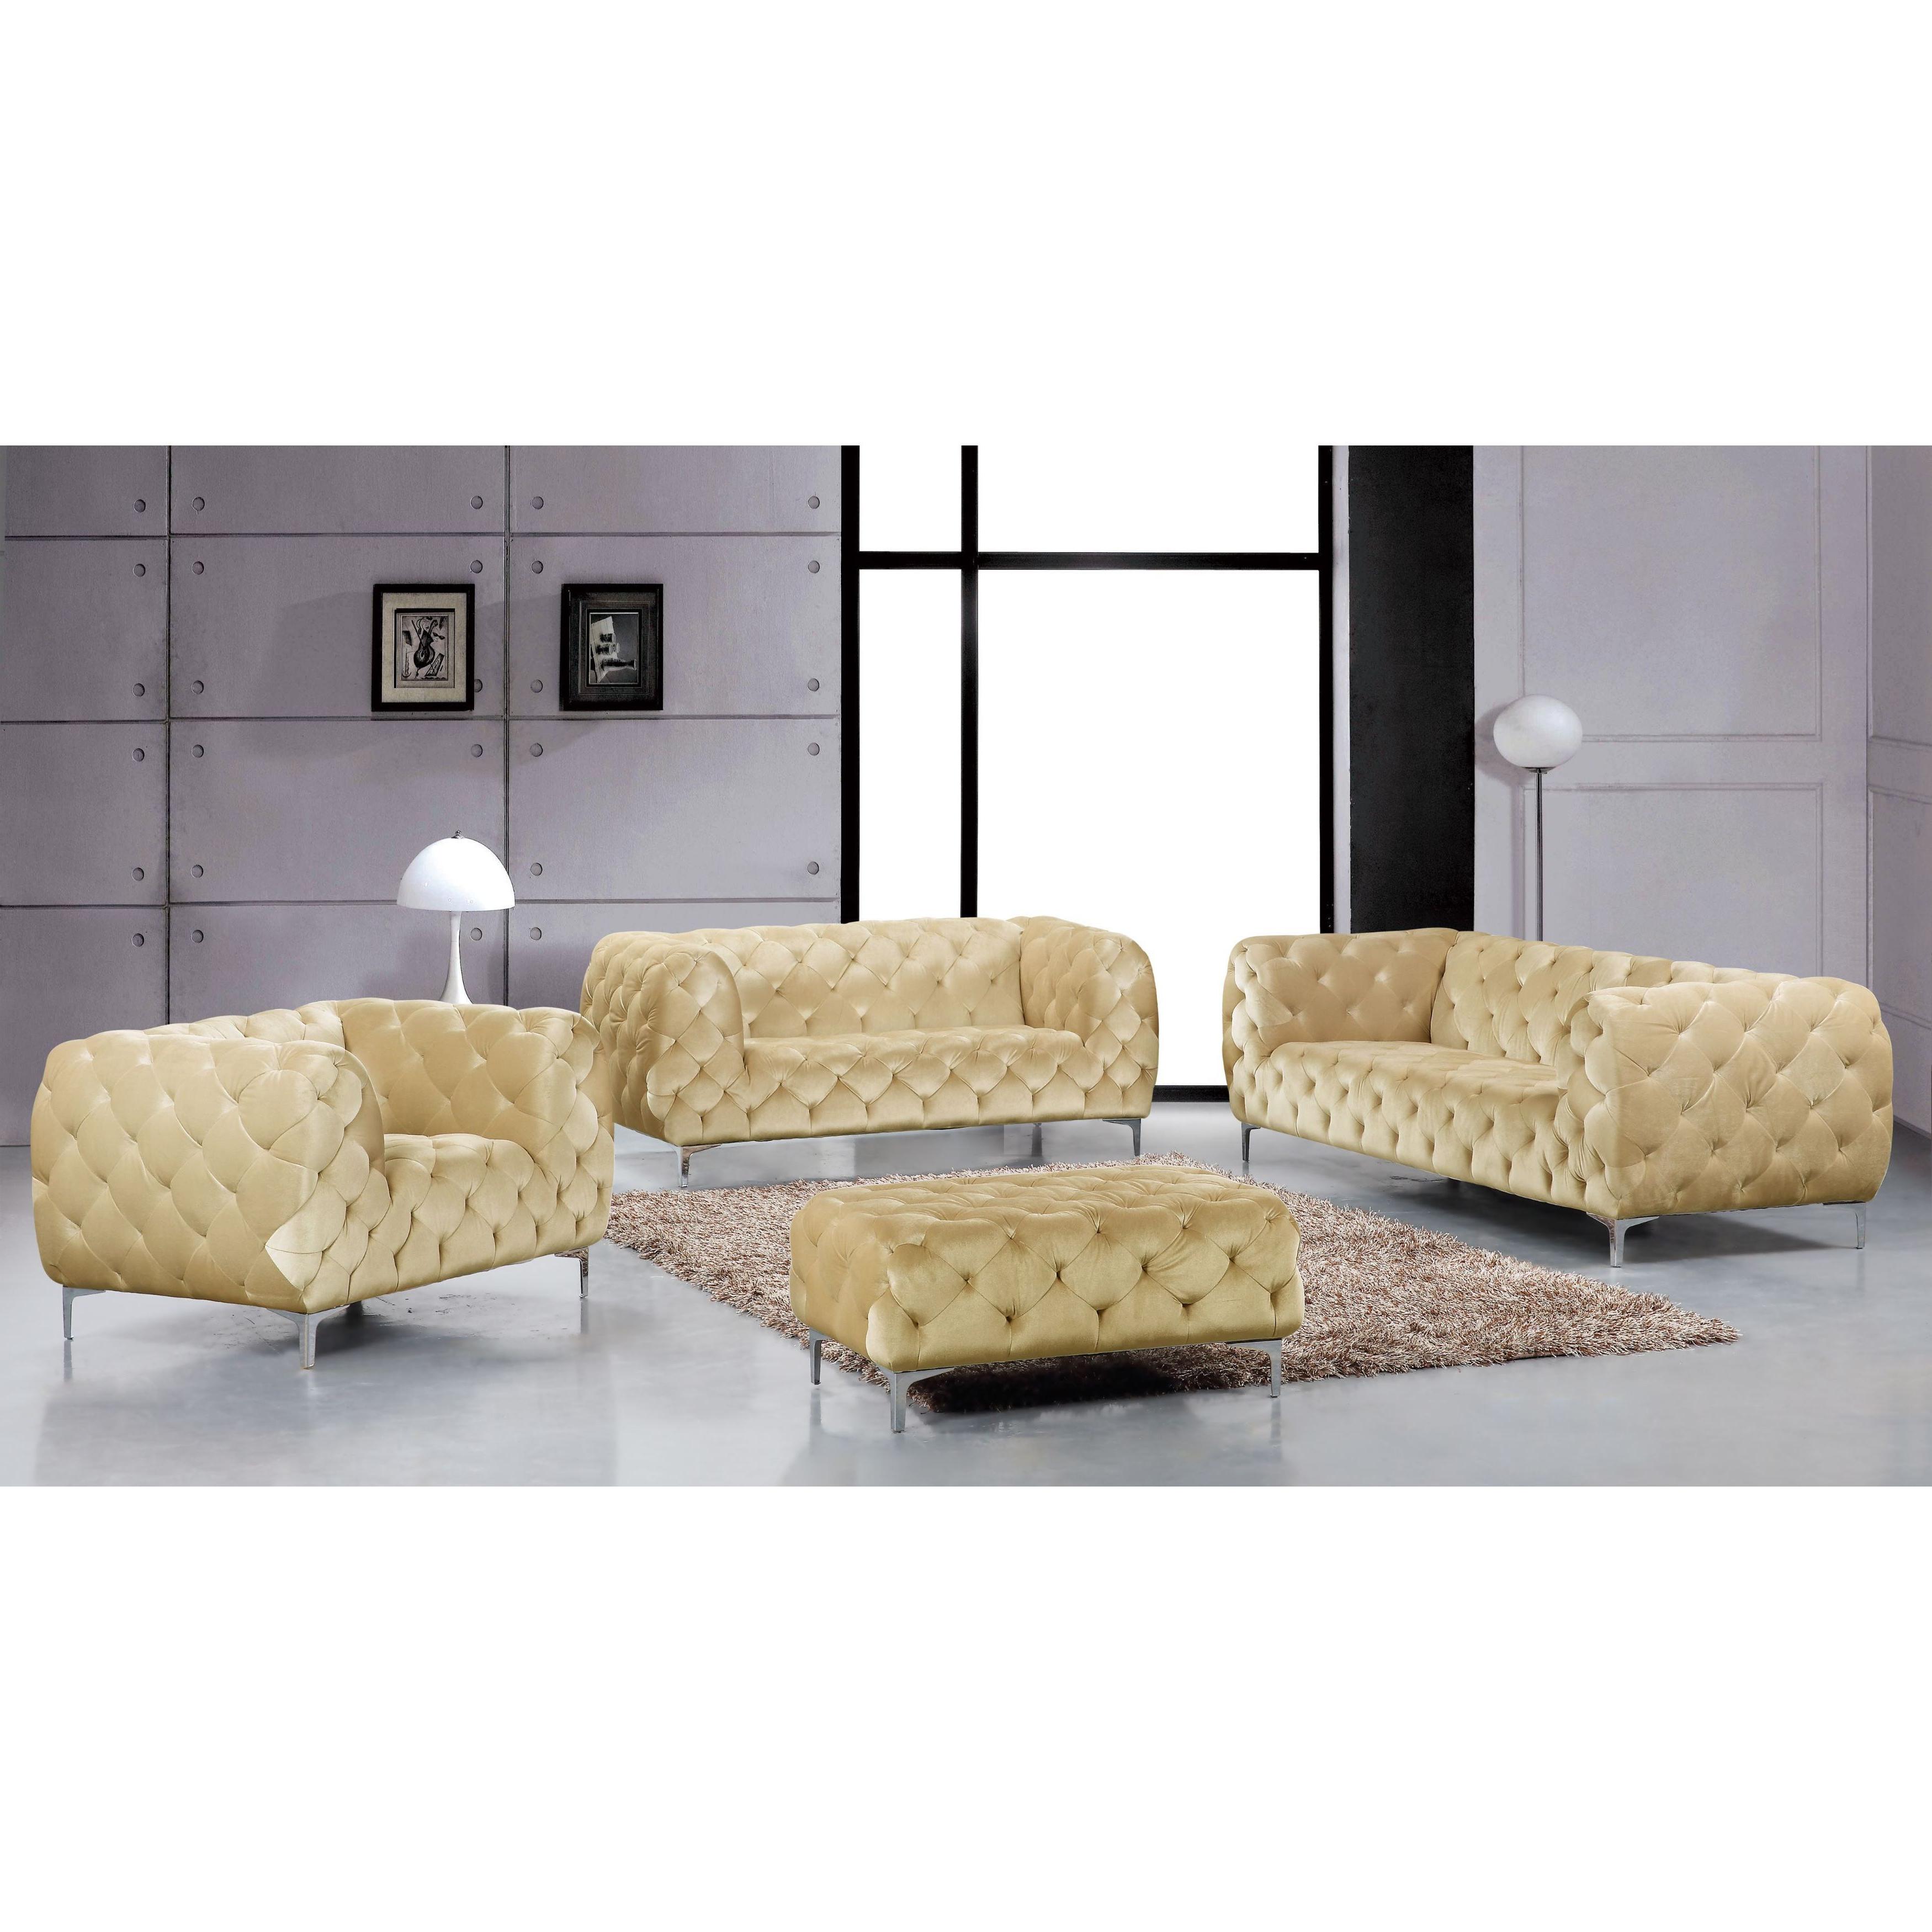 Shop Meridian Mercer Beige Velvet 4 Piece Furniture Set – Free Inside Fashionable Mercer Foam Oversized Sofa Chairs (View 18 of 20)